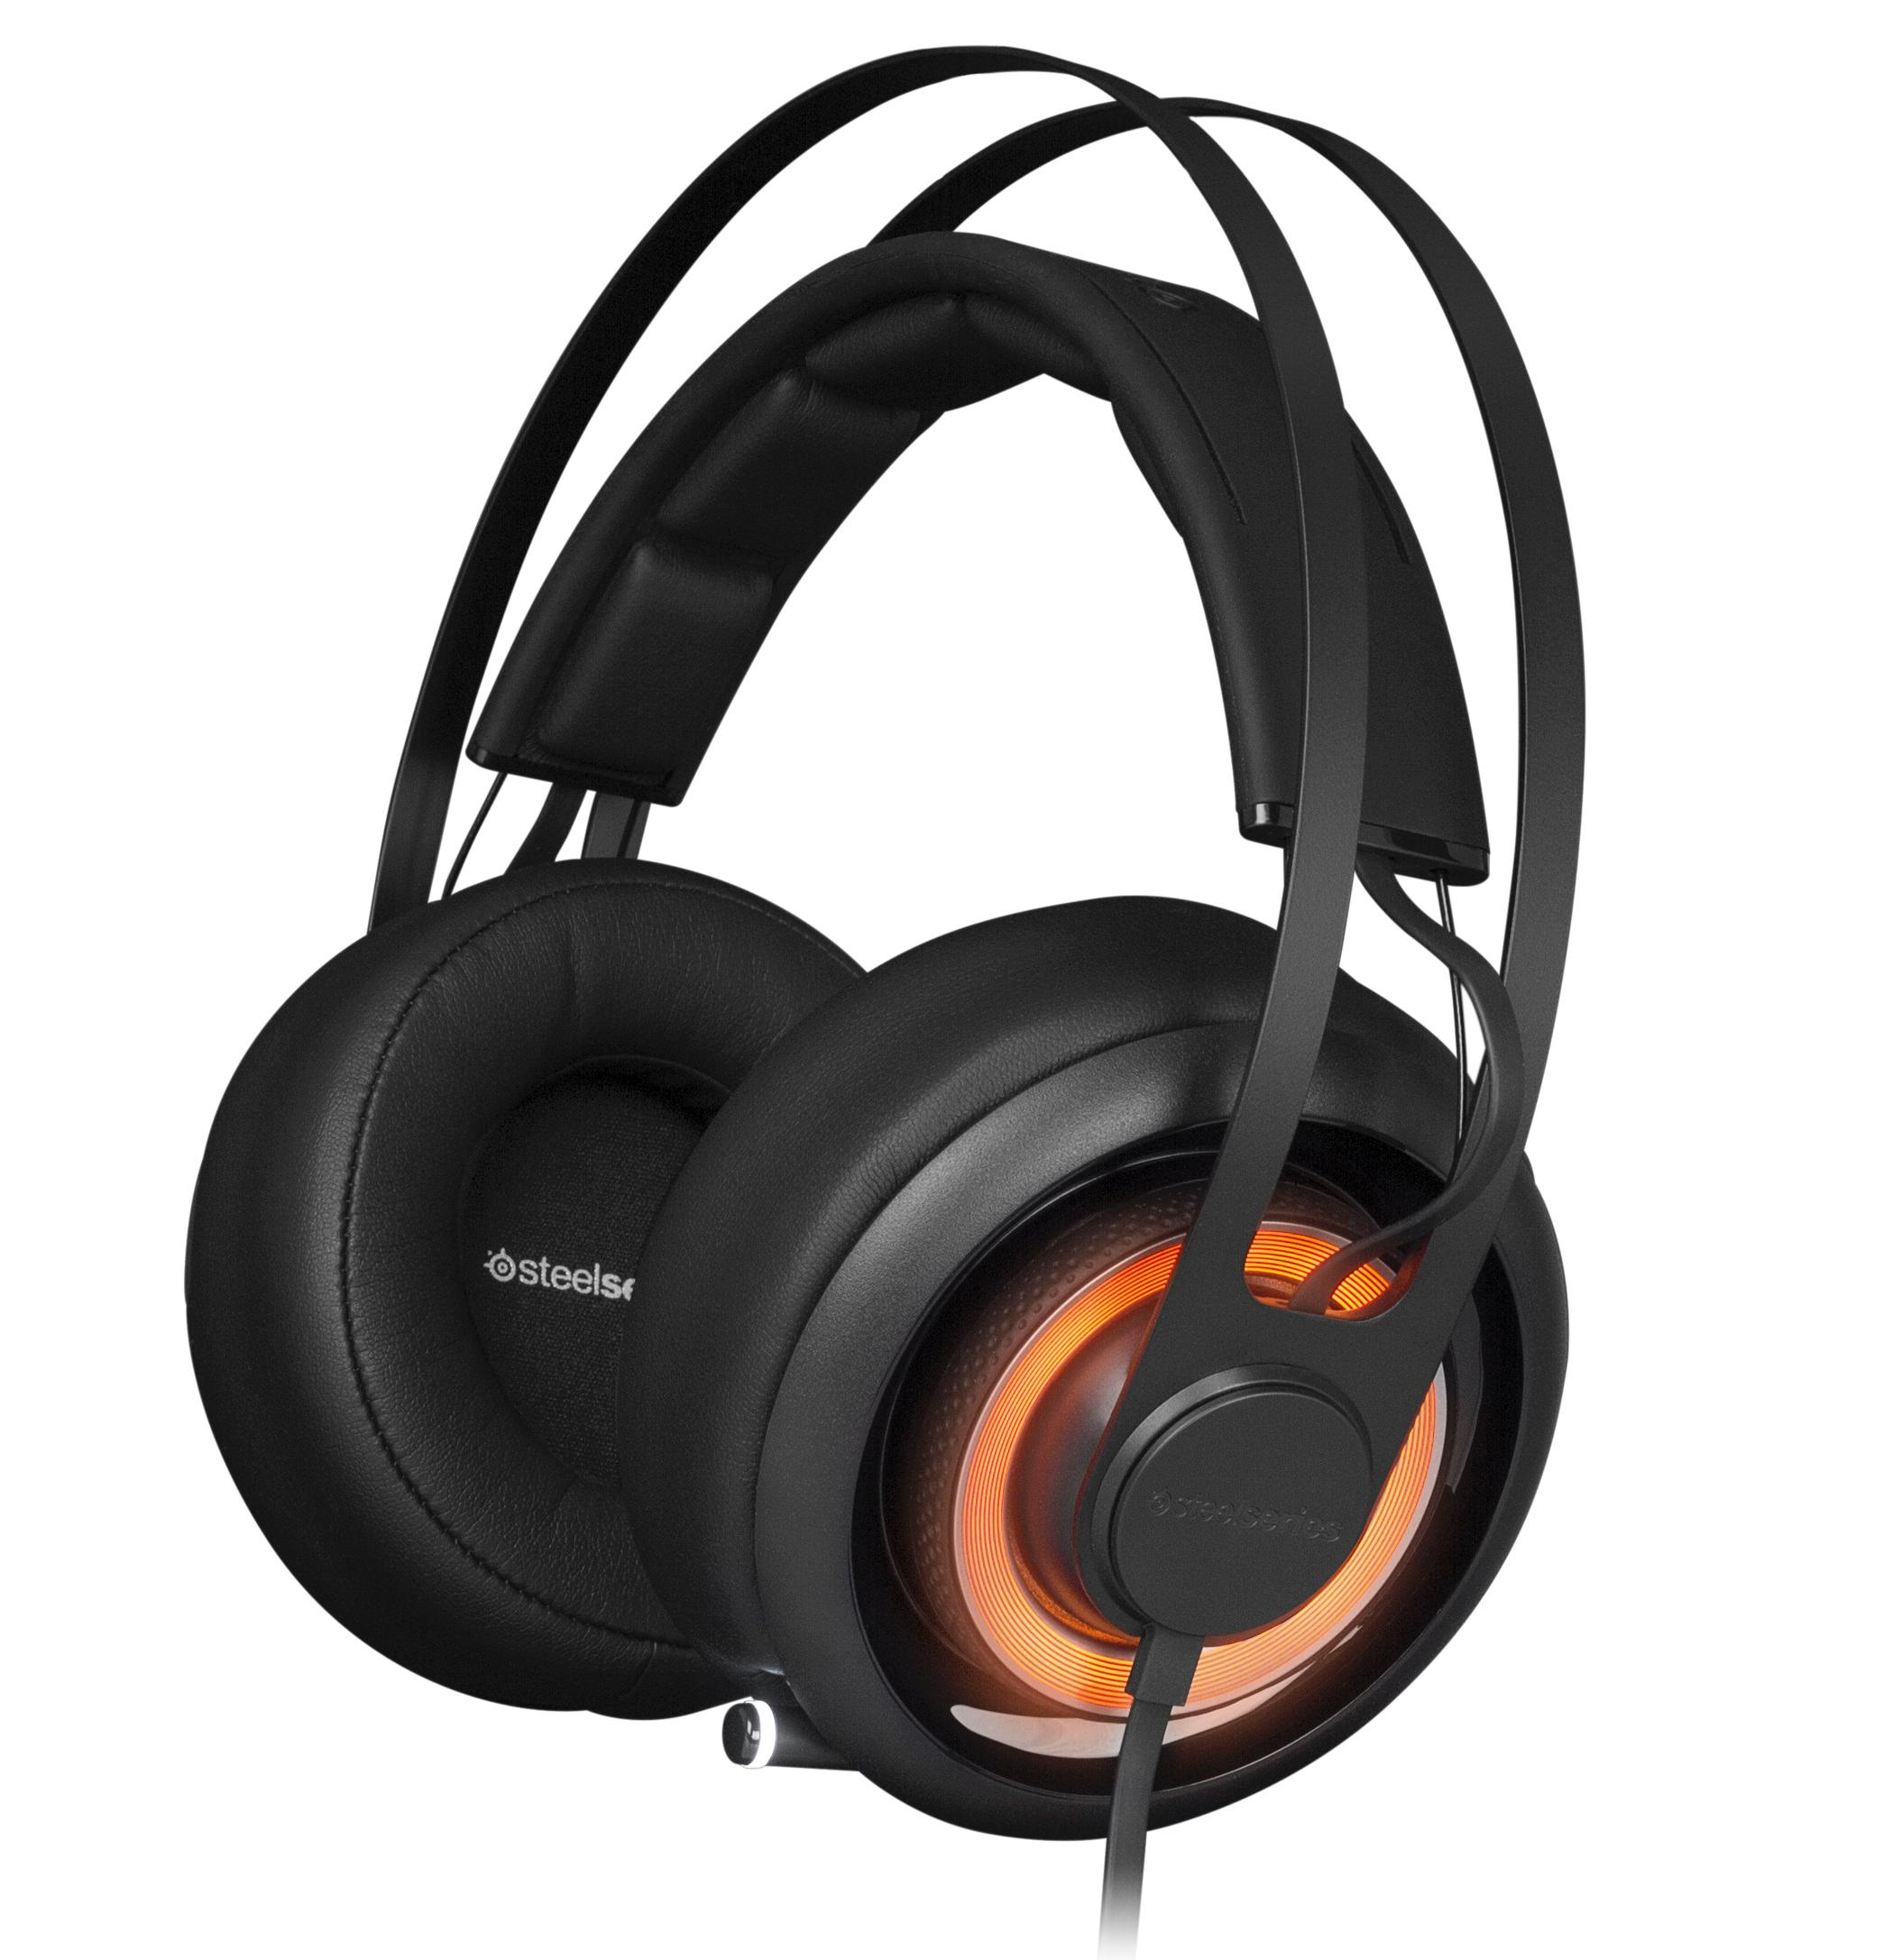 Amazon.com: SteelSeries Siberia Elite Prism Gaming Headset ...